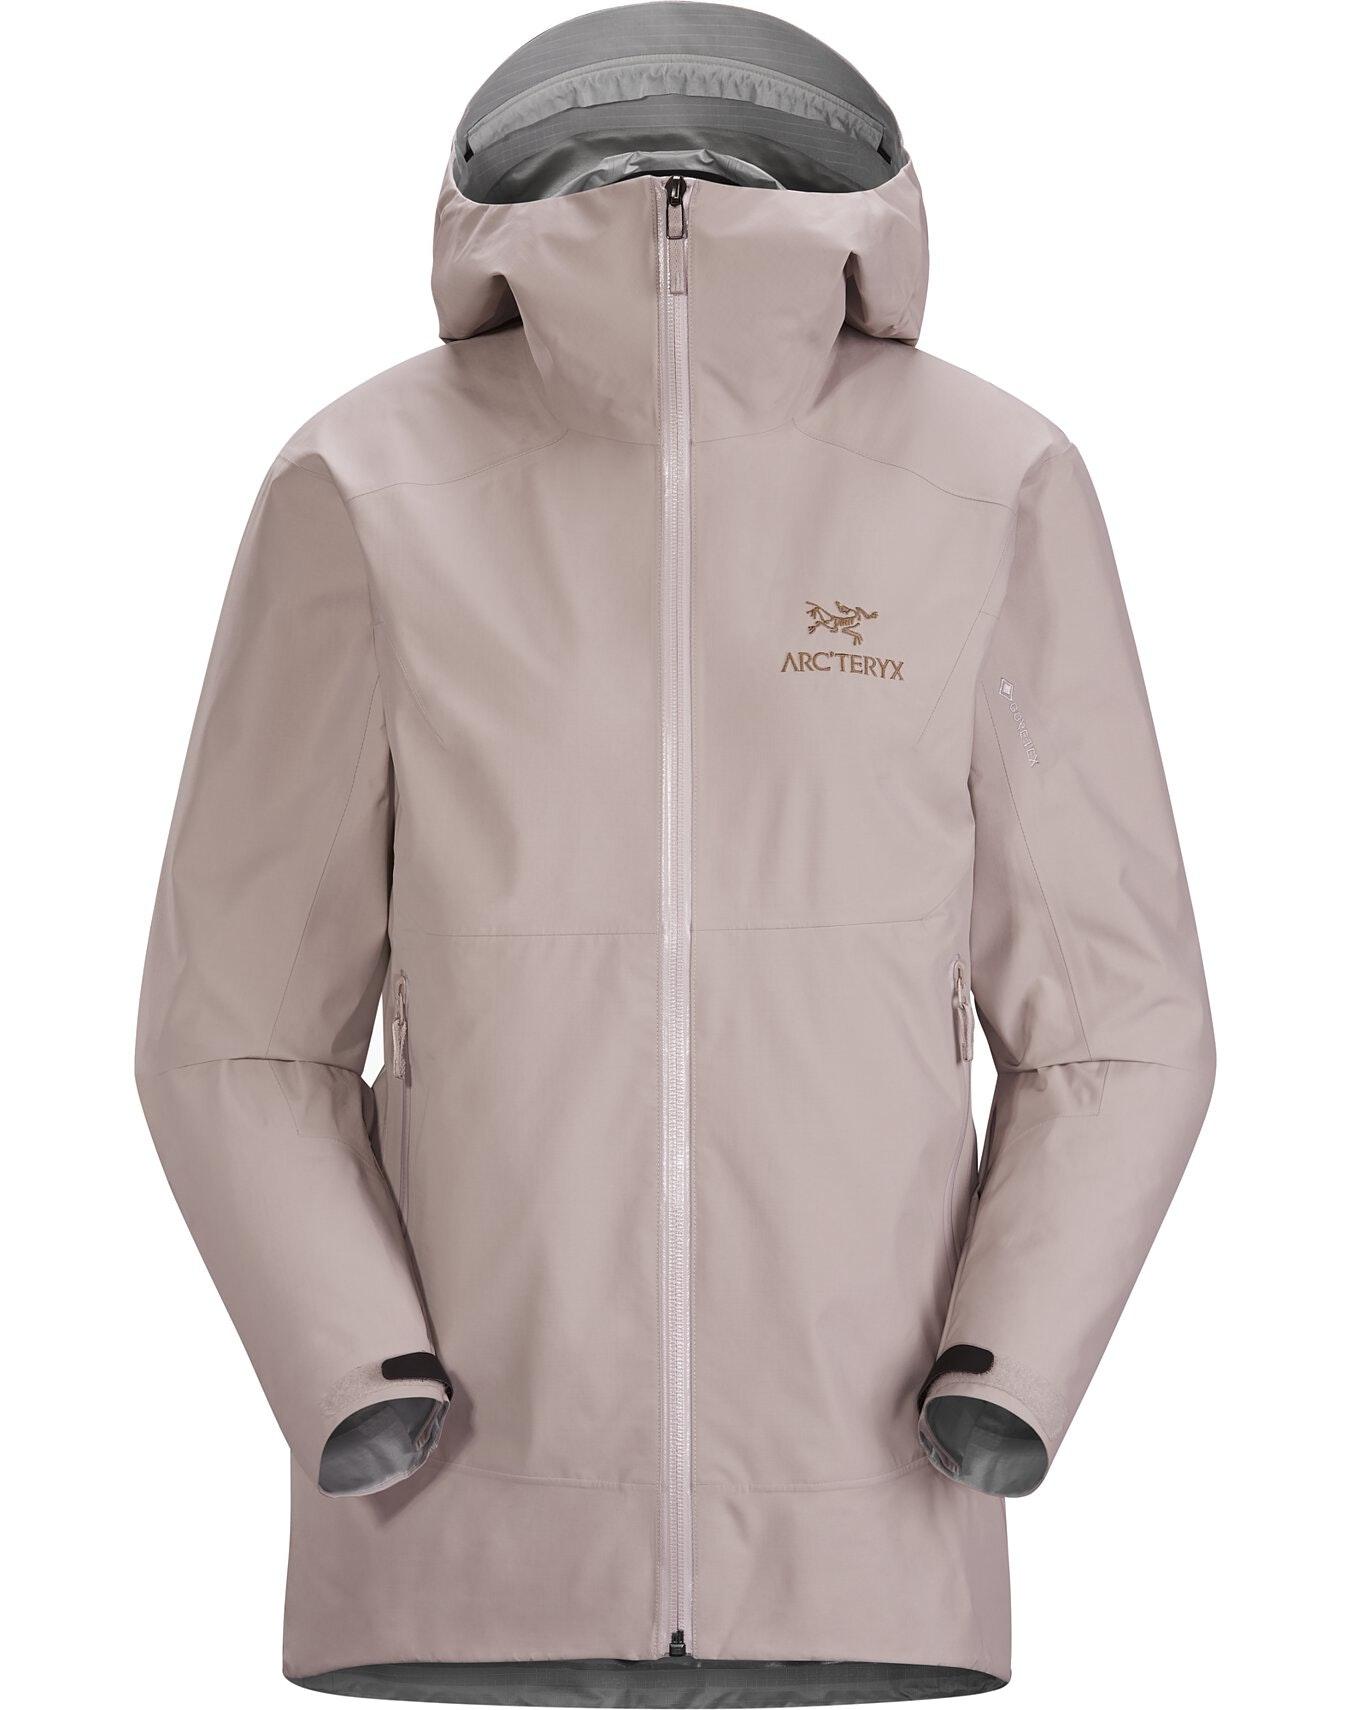 Zeta SL Jacket Verra